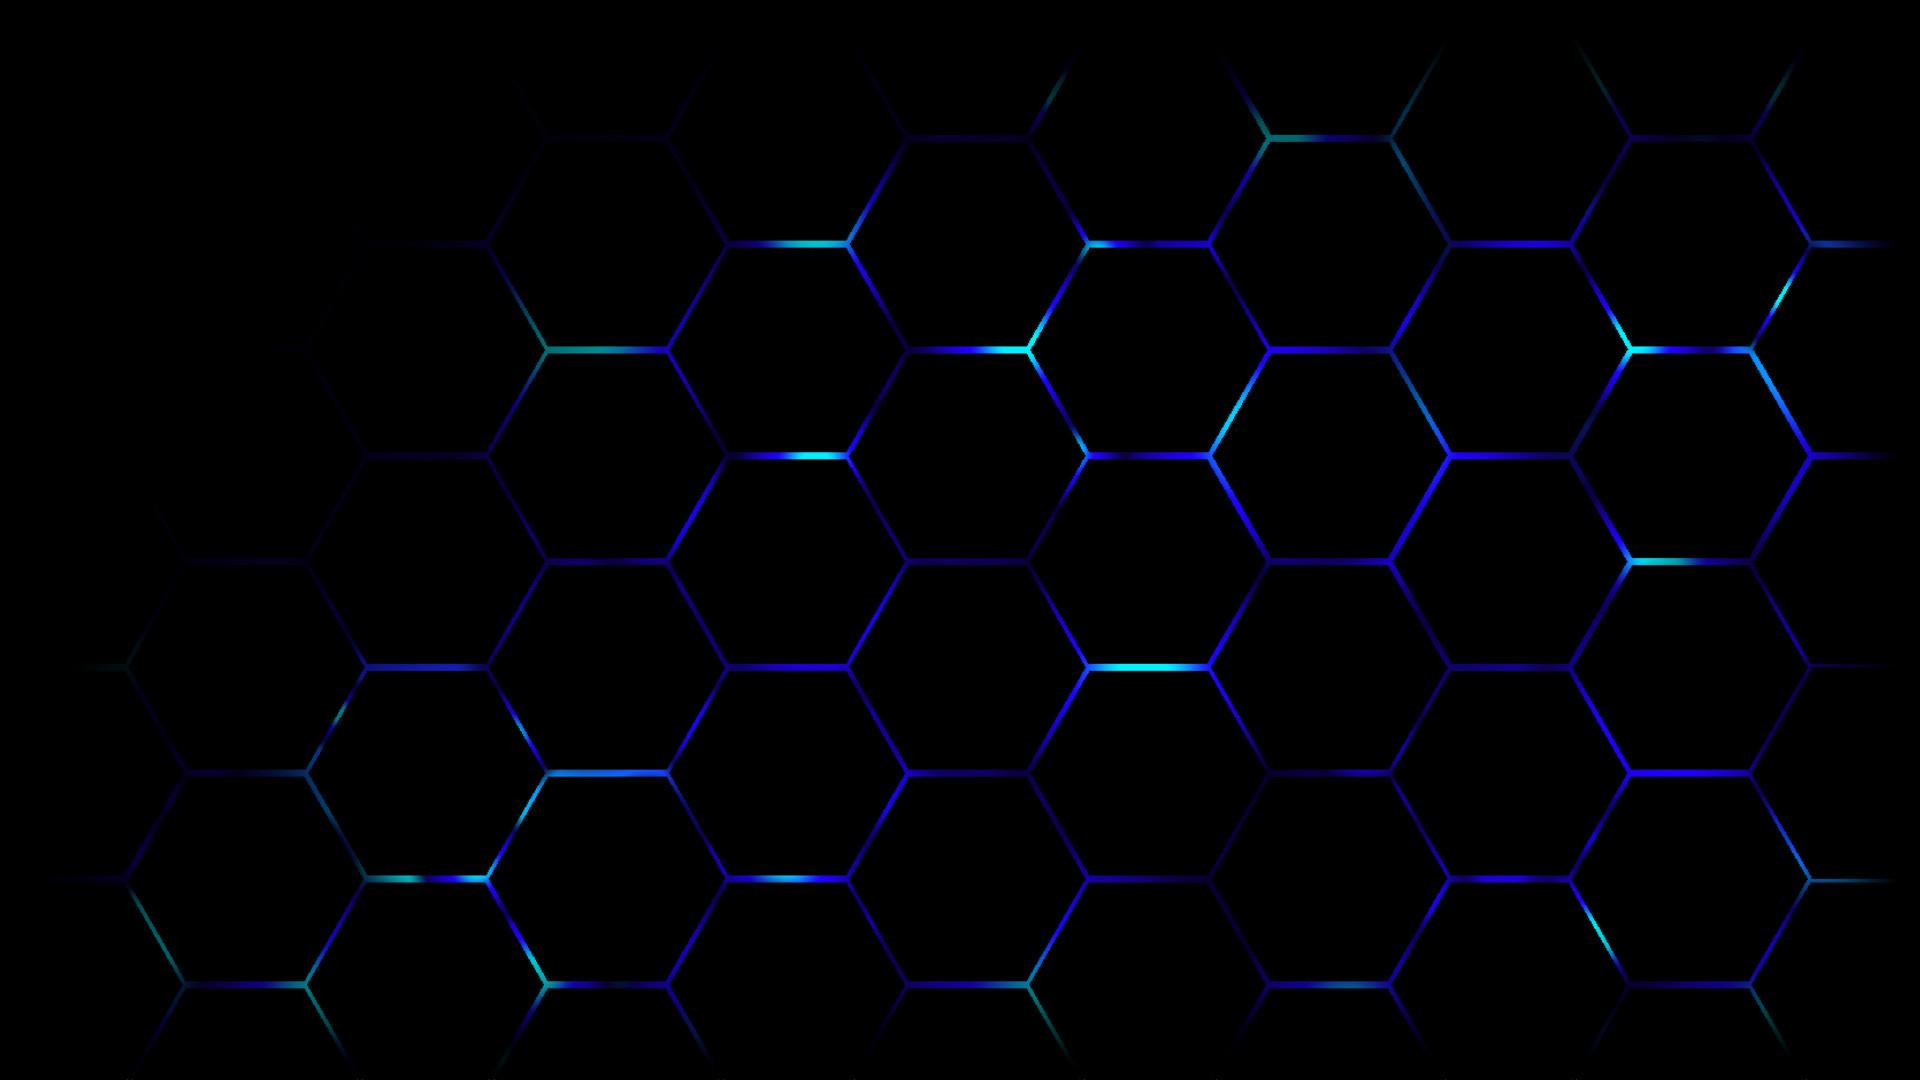 Blue Wallpaper wallpaper